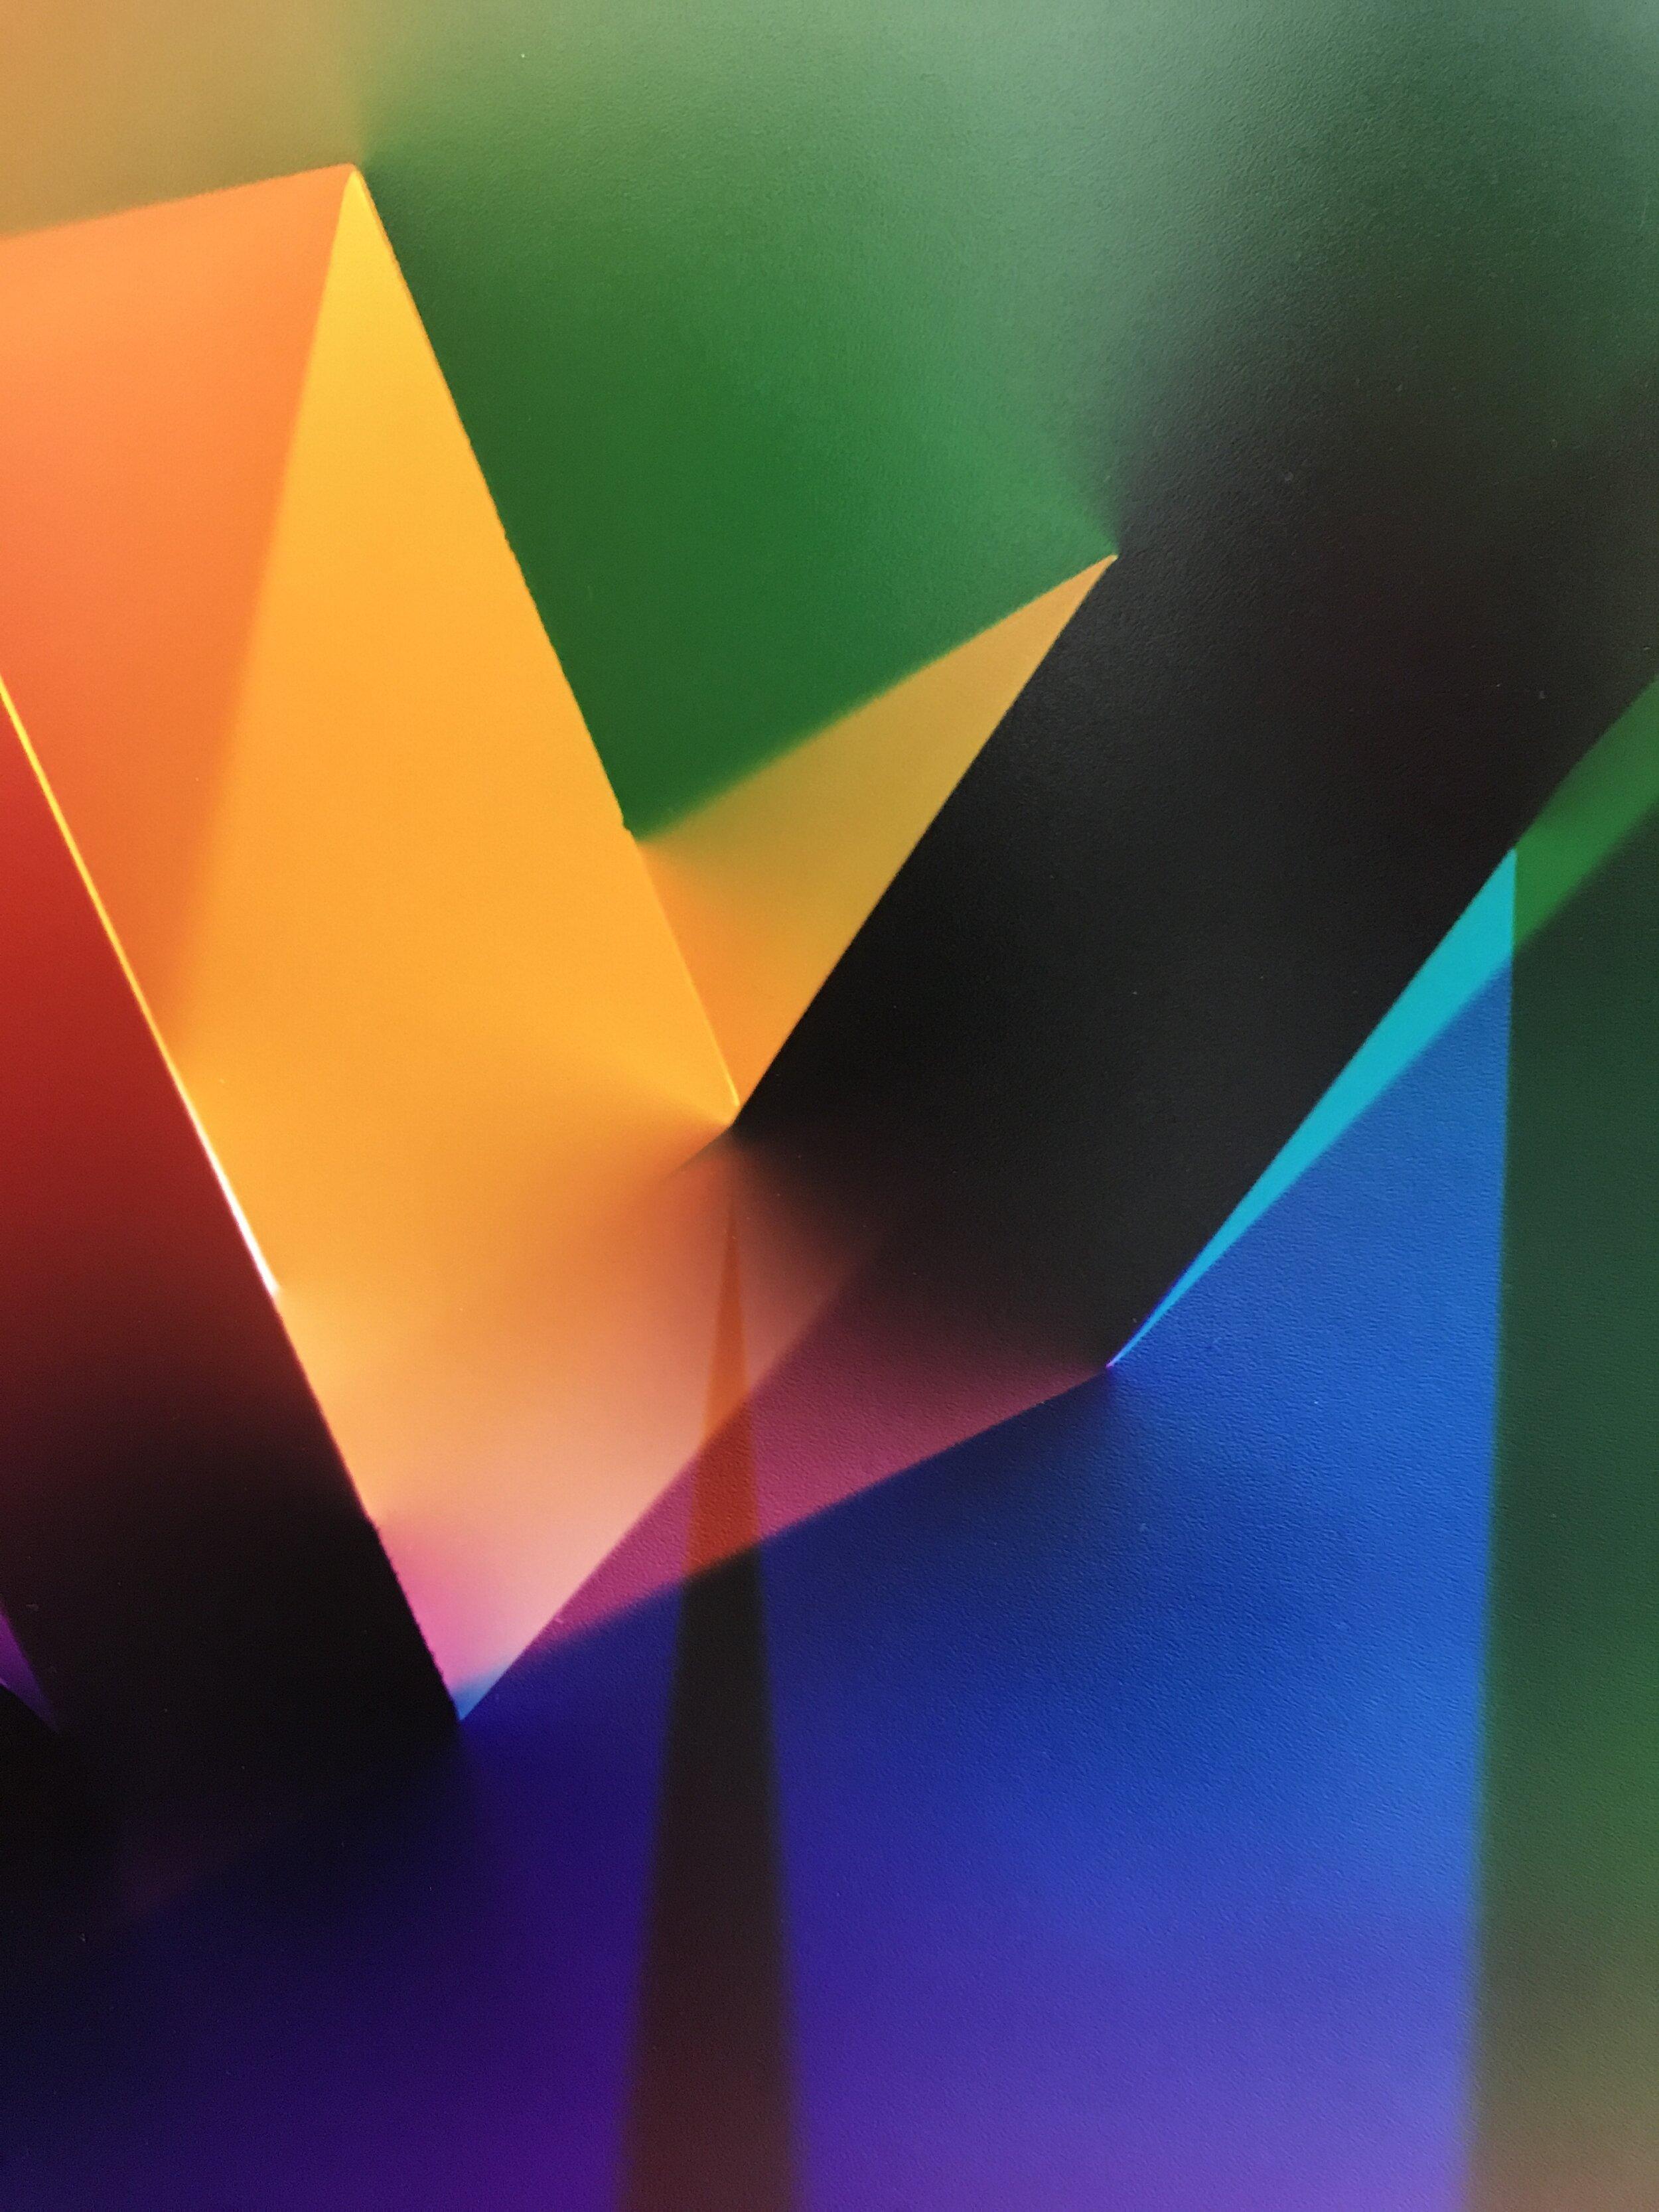 Natalja Kent Group Study Movement Artifacts Unusual Colors 2